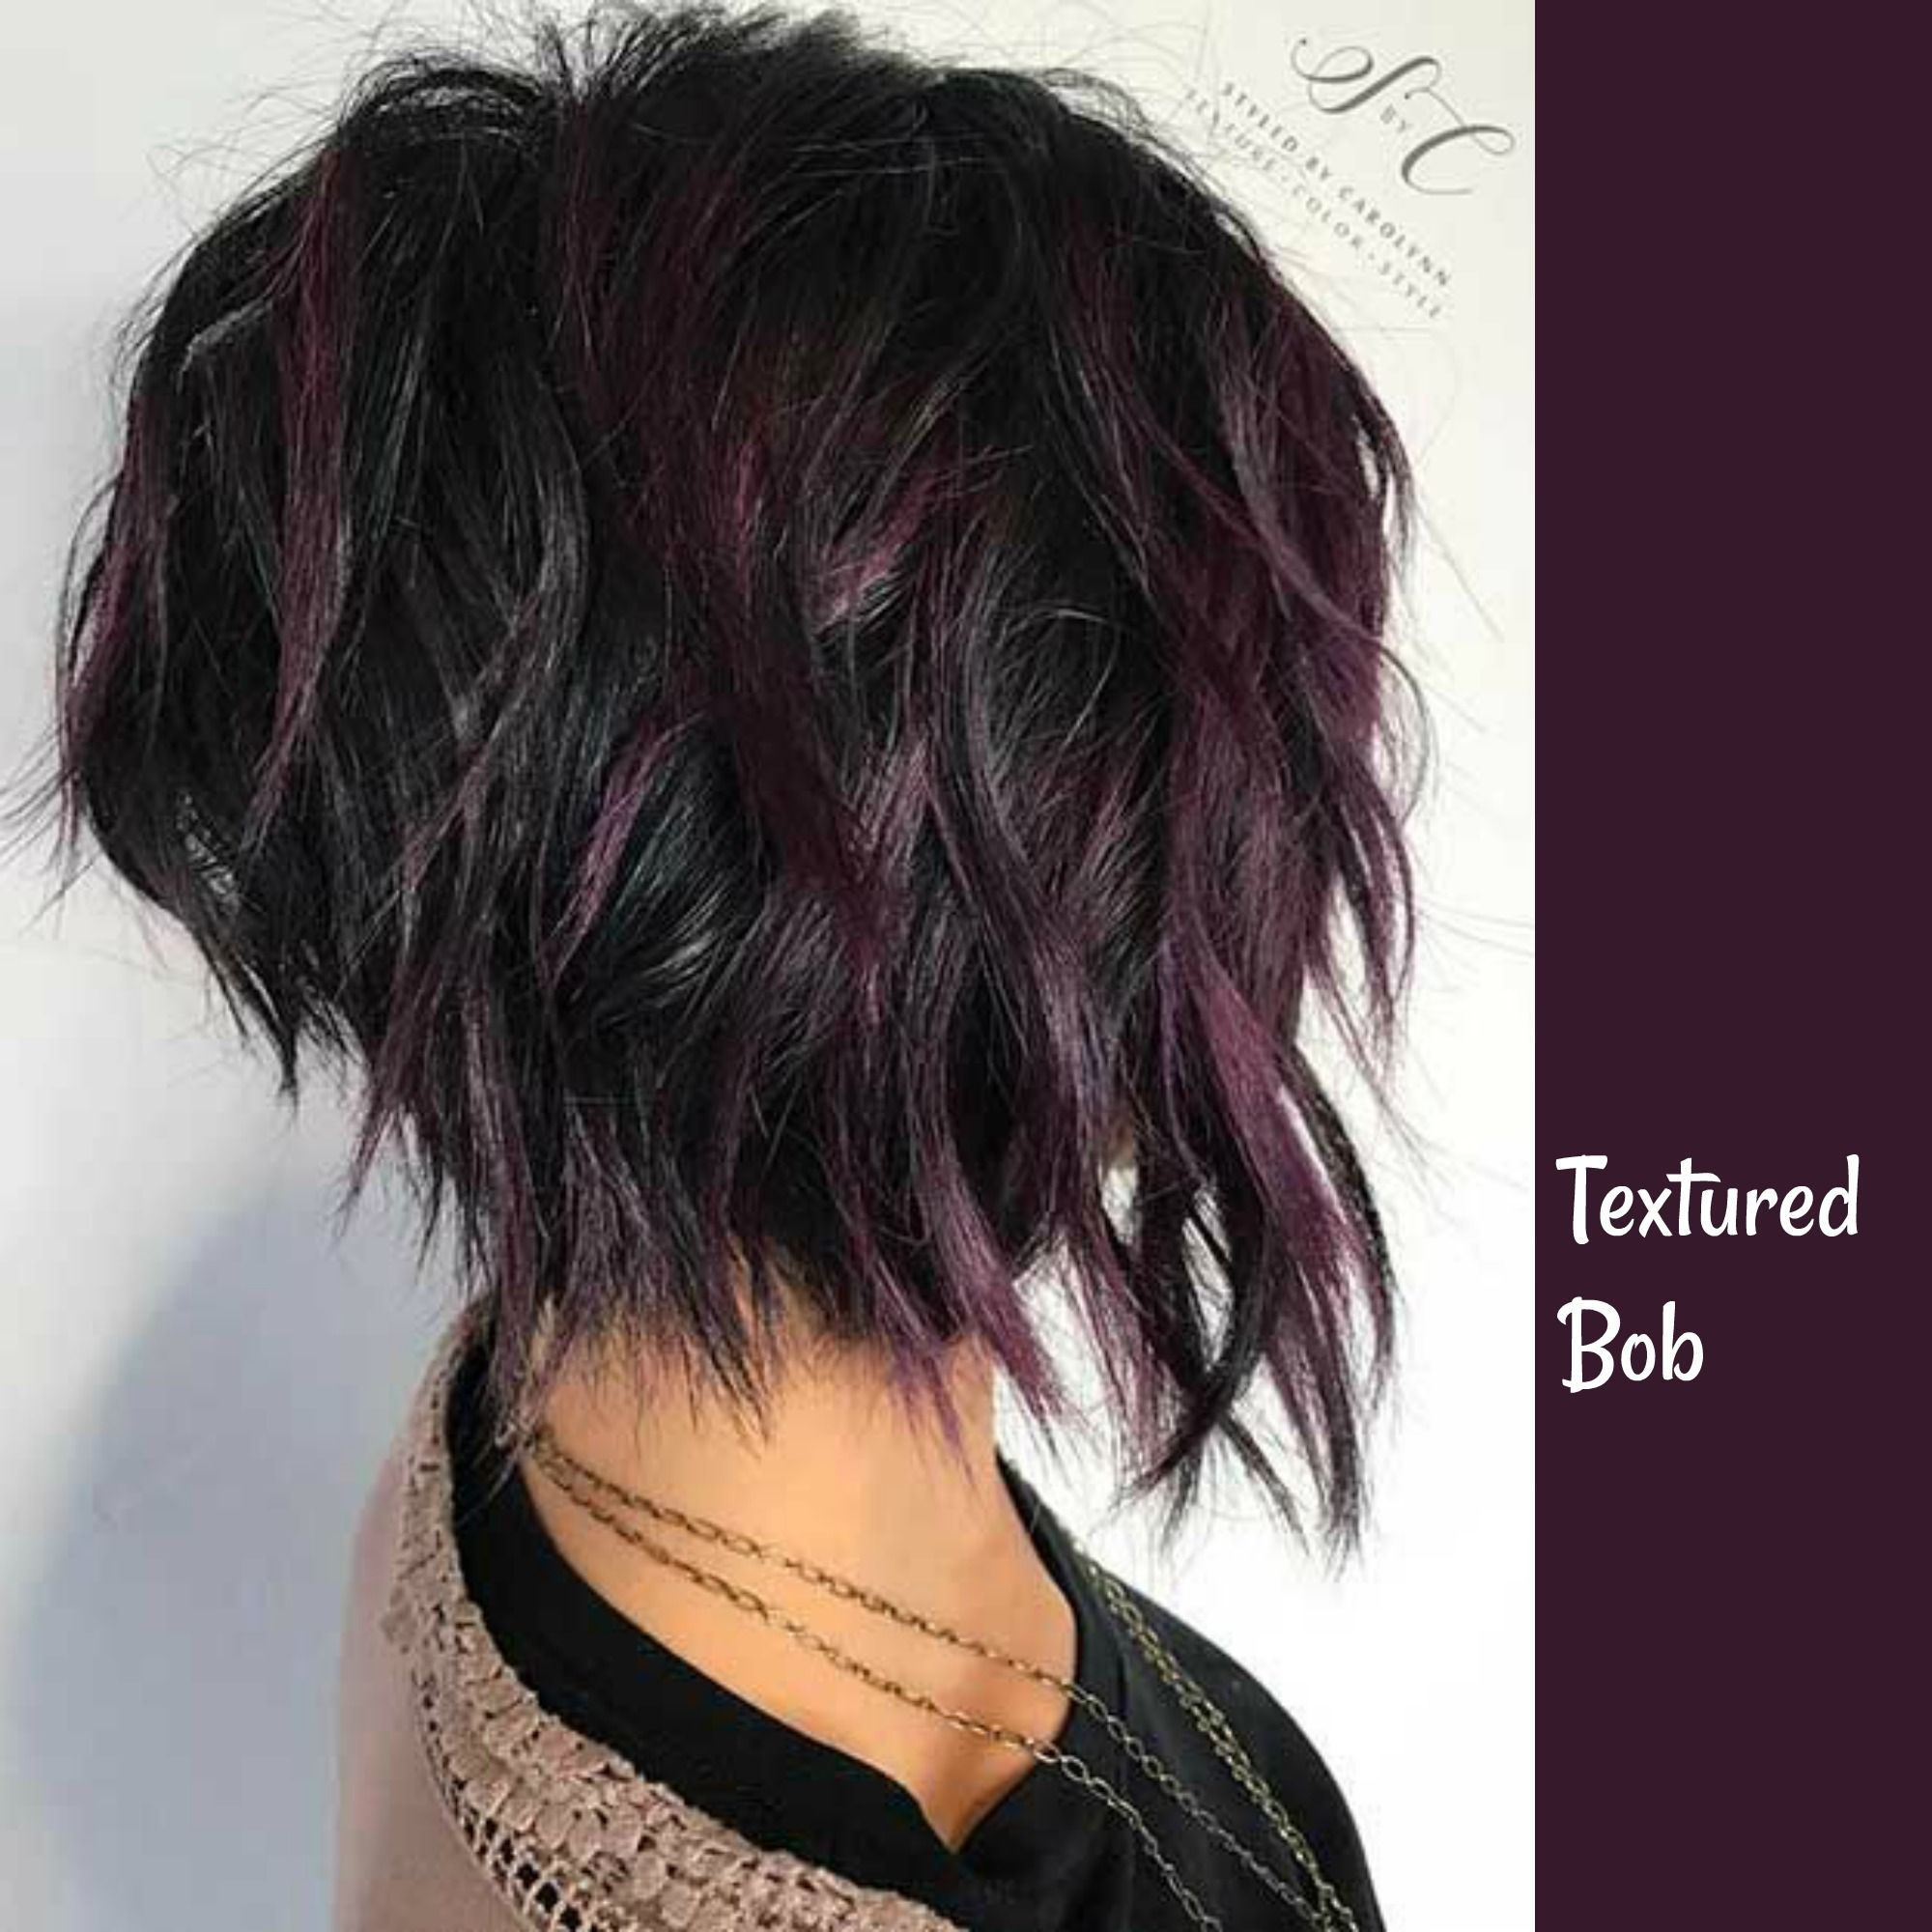 Textured Bob With Purple Highlights On Dark Hair Beauty Pinterest